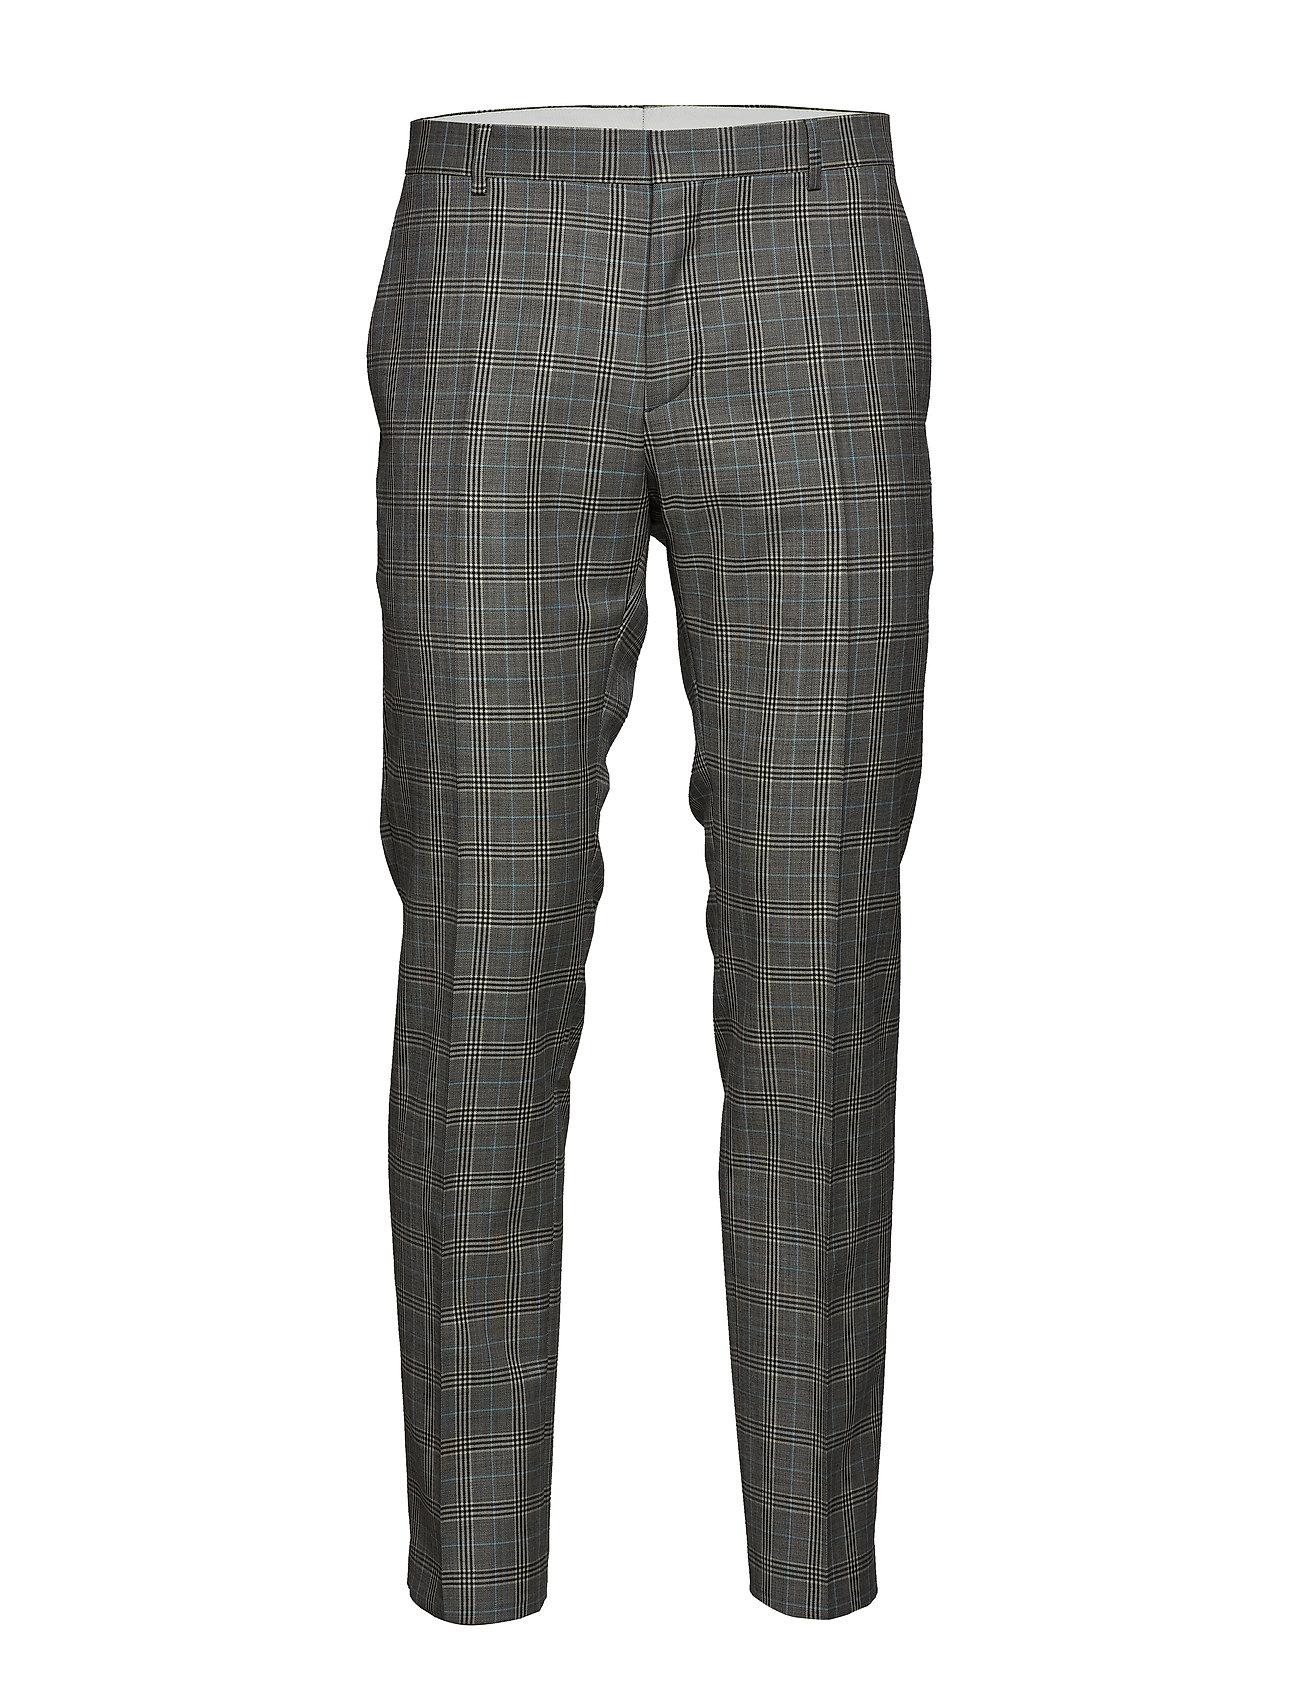 CALVIN KLEIN Glencheck S120 Suit, Anzughosen Businesshosen Grau CALVIN KLEIN